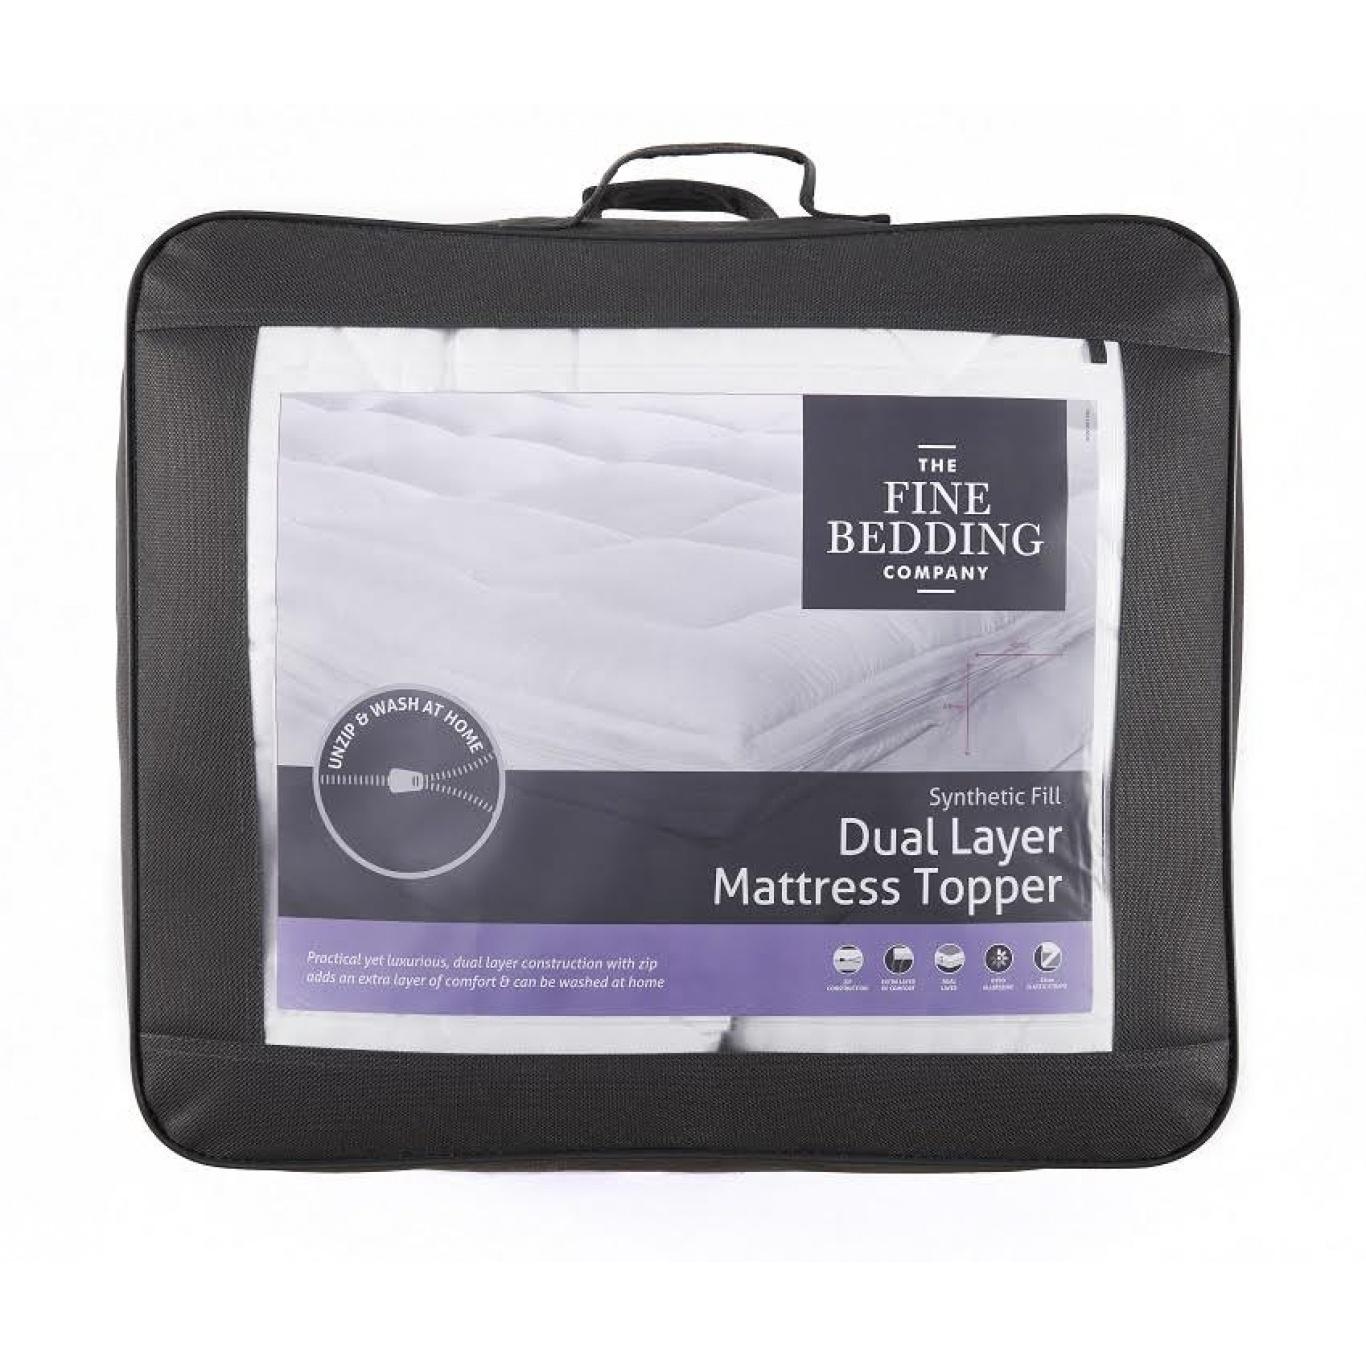 Image of Dual Layer Single Mattress Topper